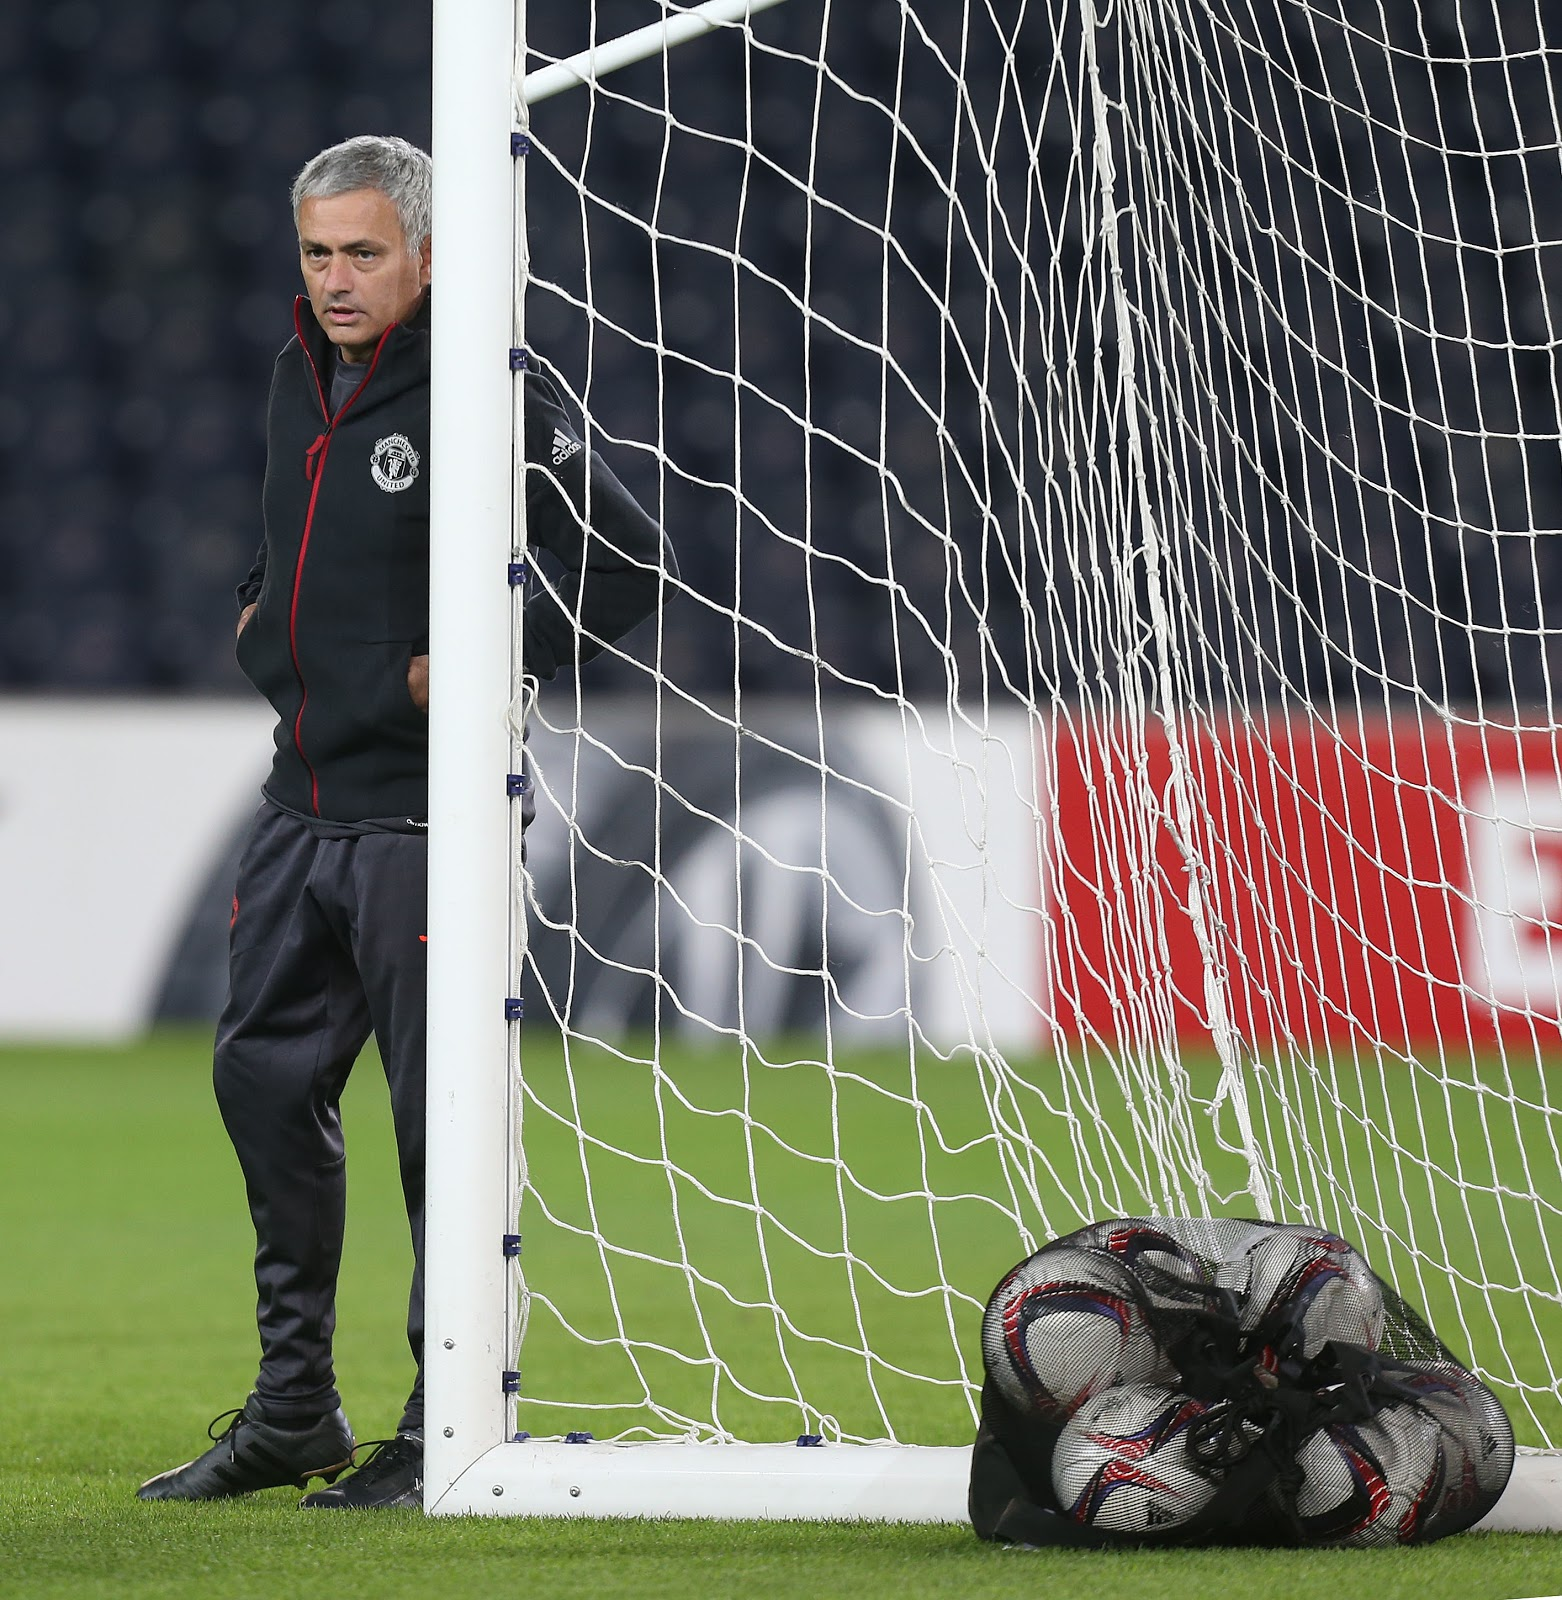 mourinho-porsche-boots-full